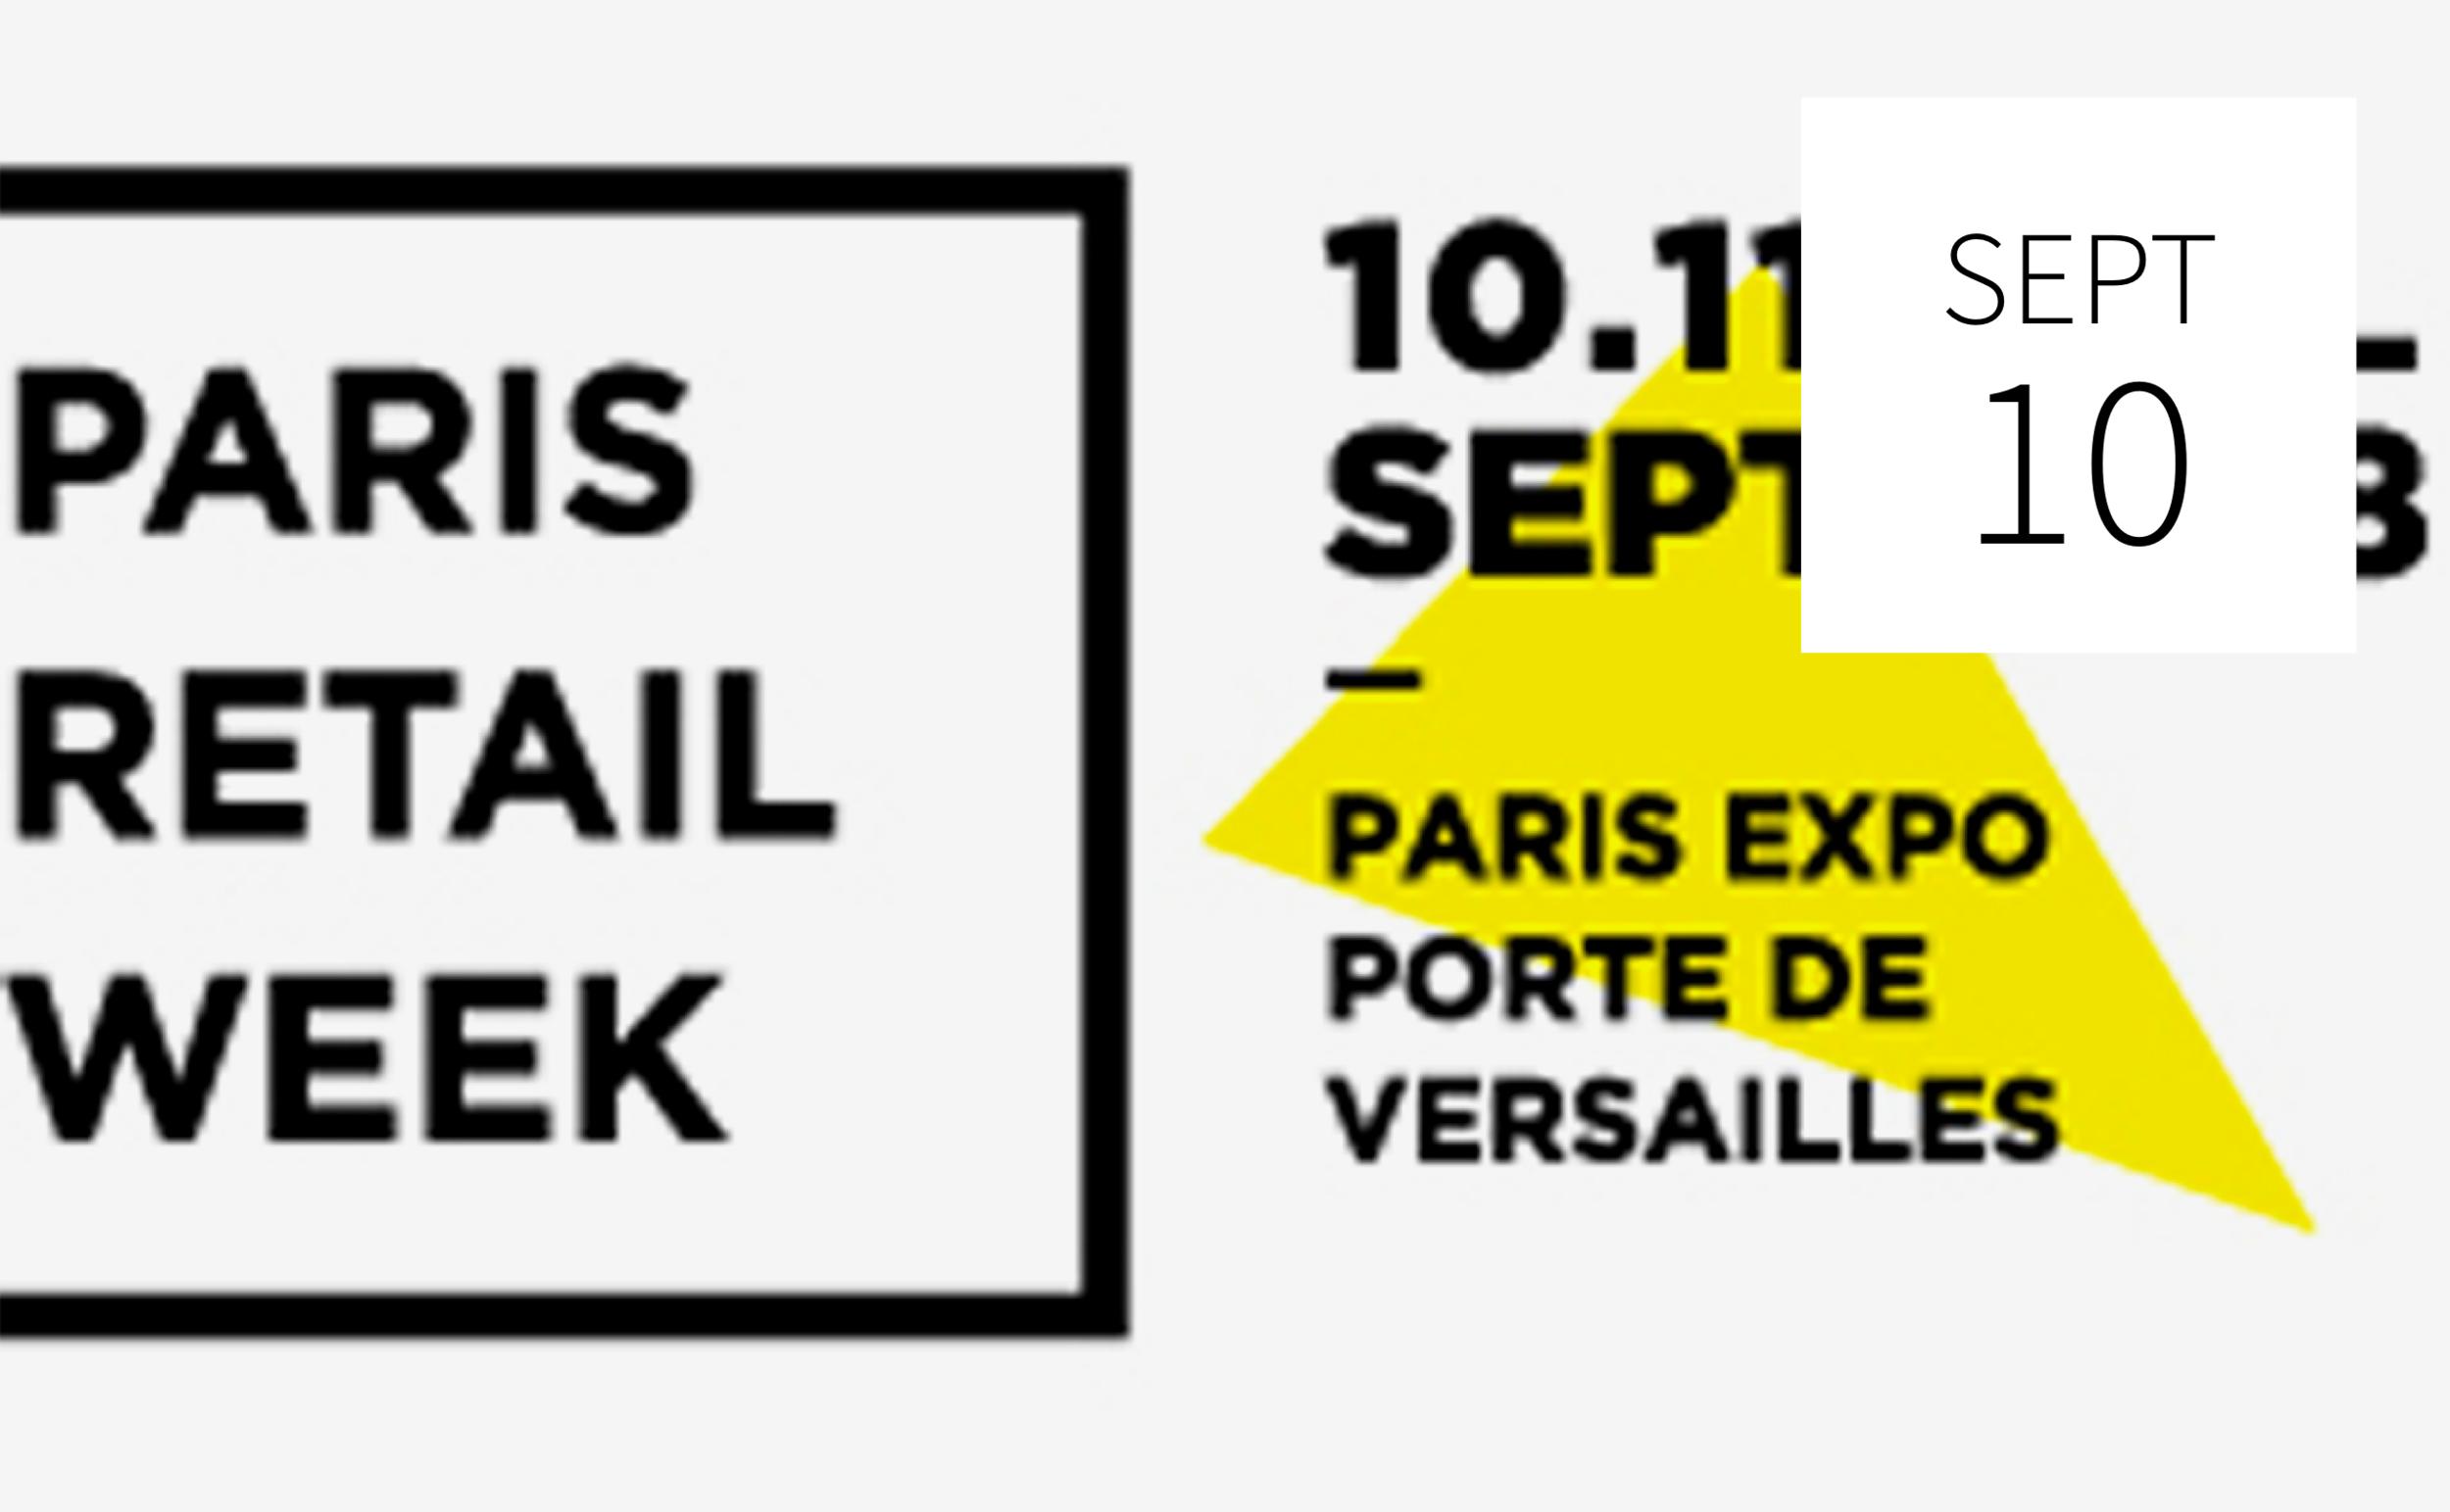 paris-retail-week-event